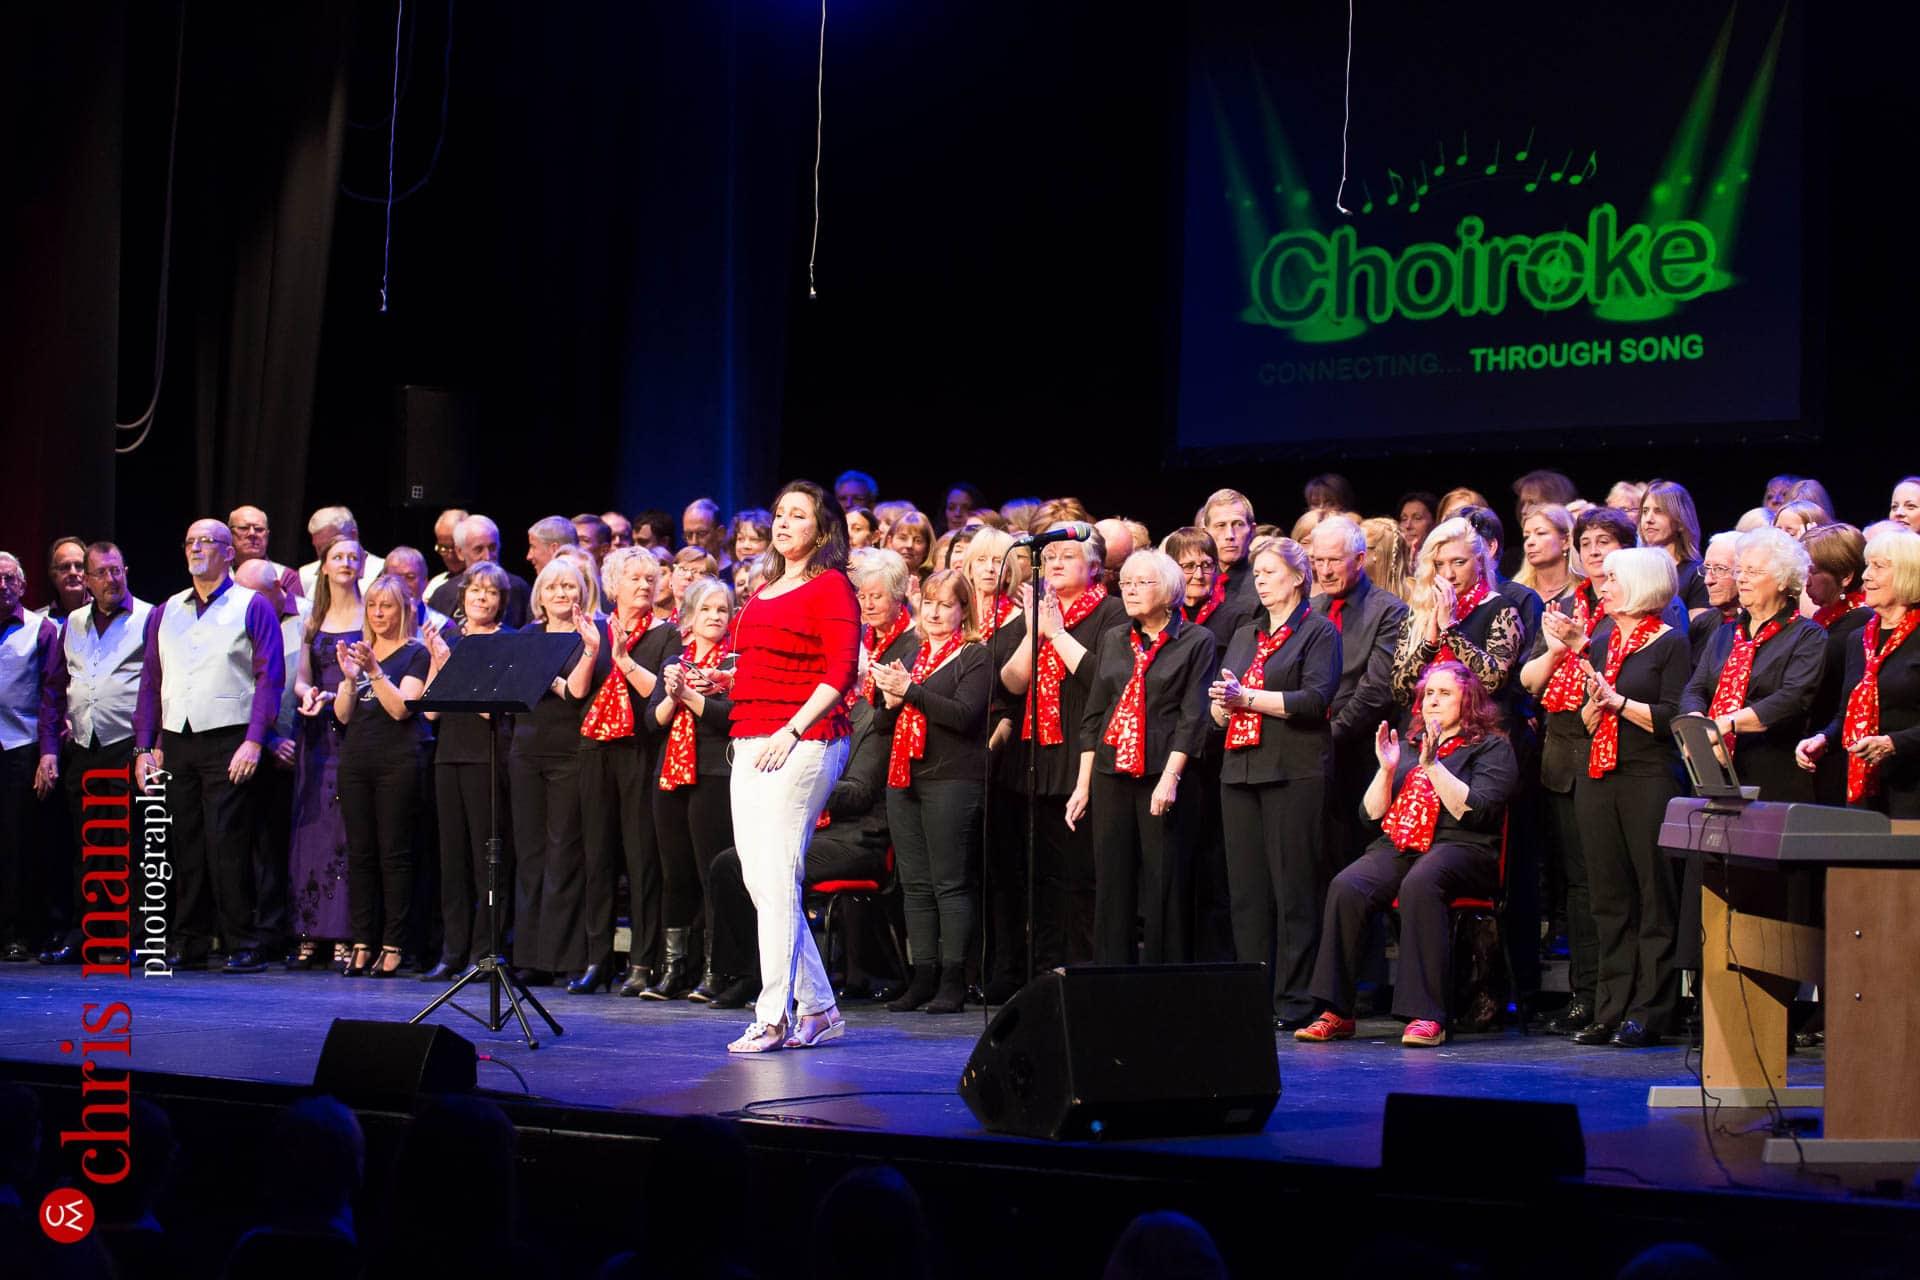 Choiroke-2016-concert-Dorking-Halls-037